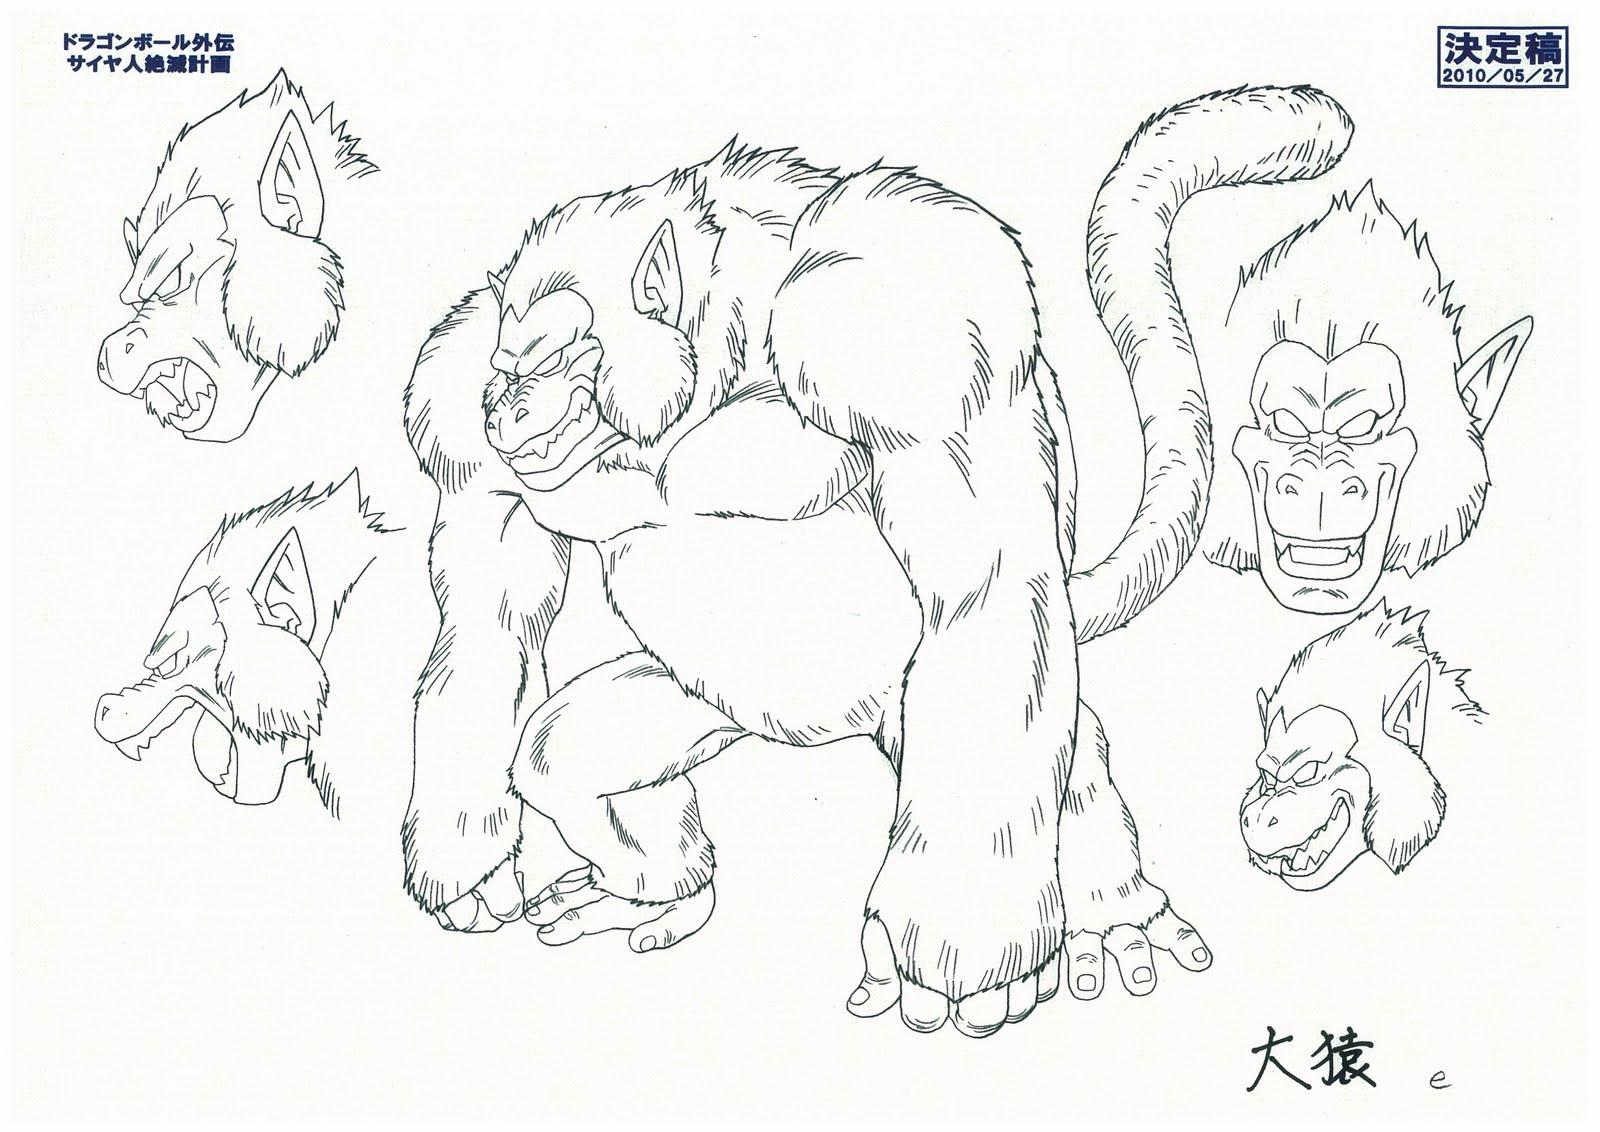 Character Design Dragon Ball Z : Otaku comment primeras imágenes de dragon ball z gaiden